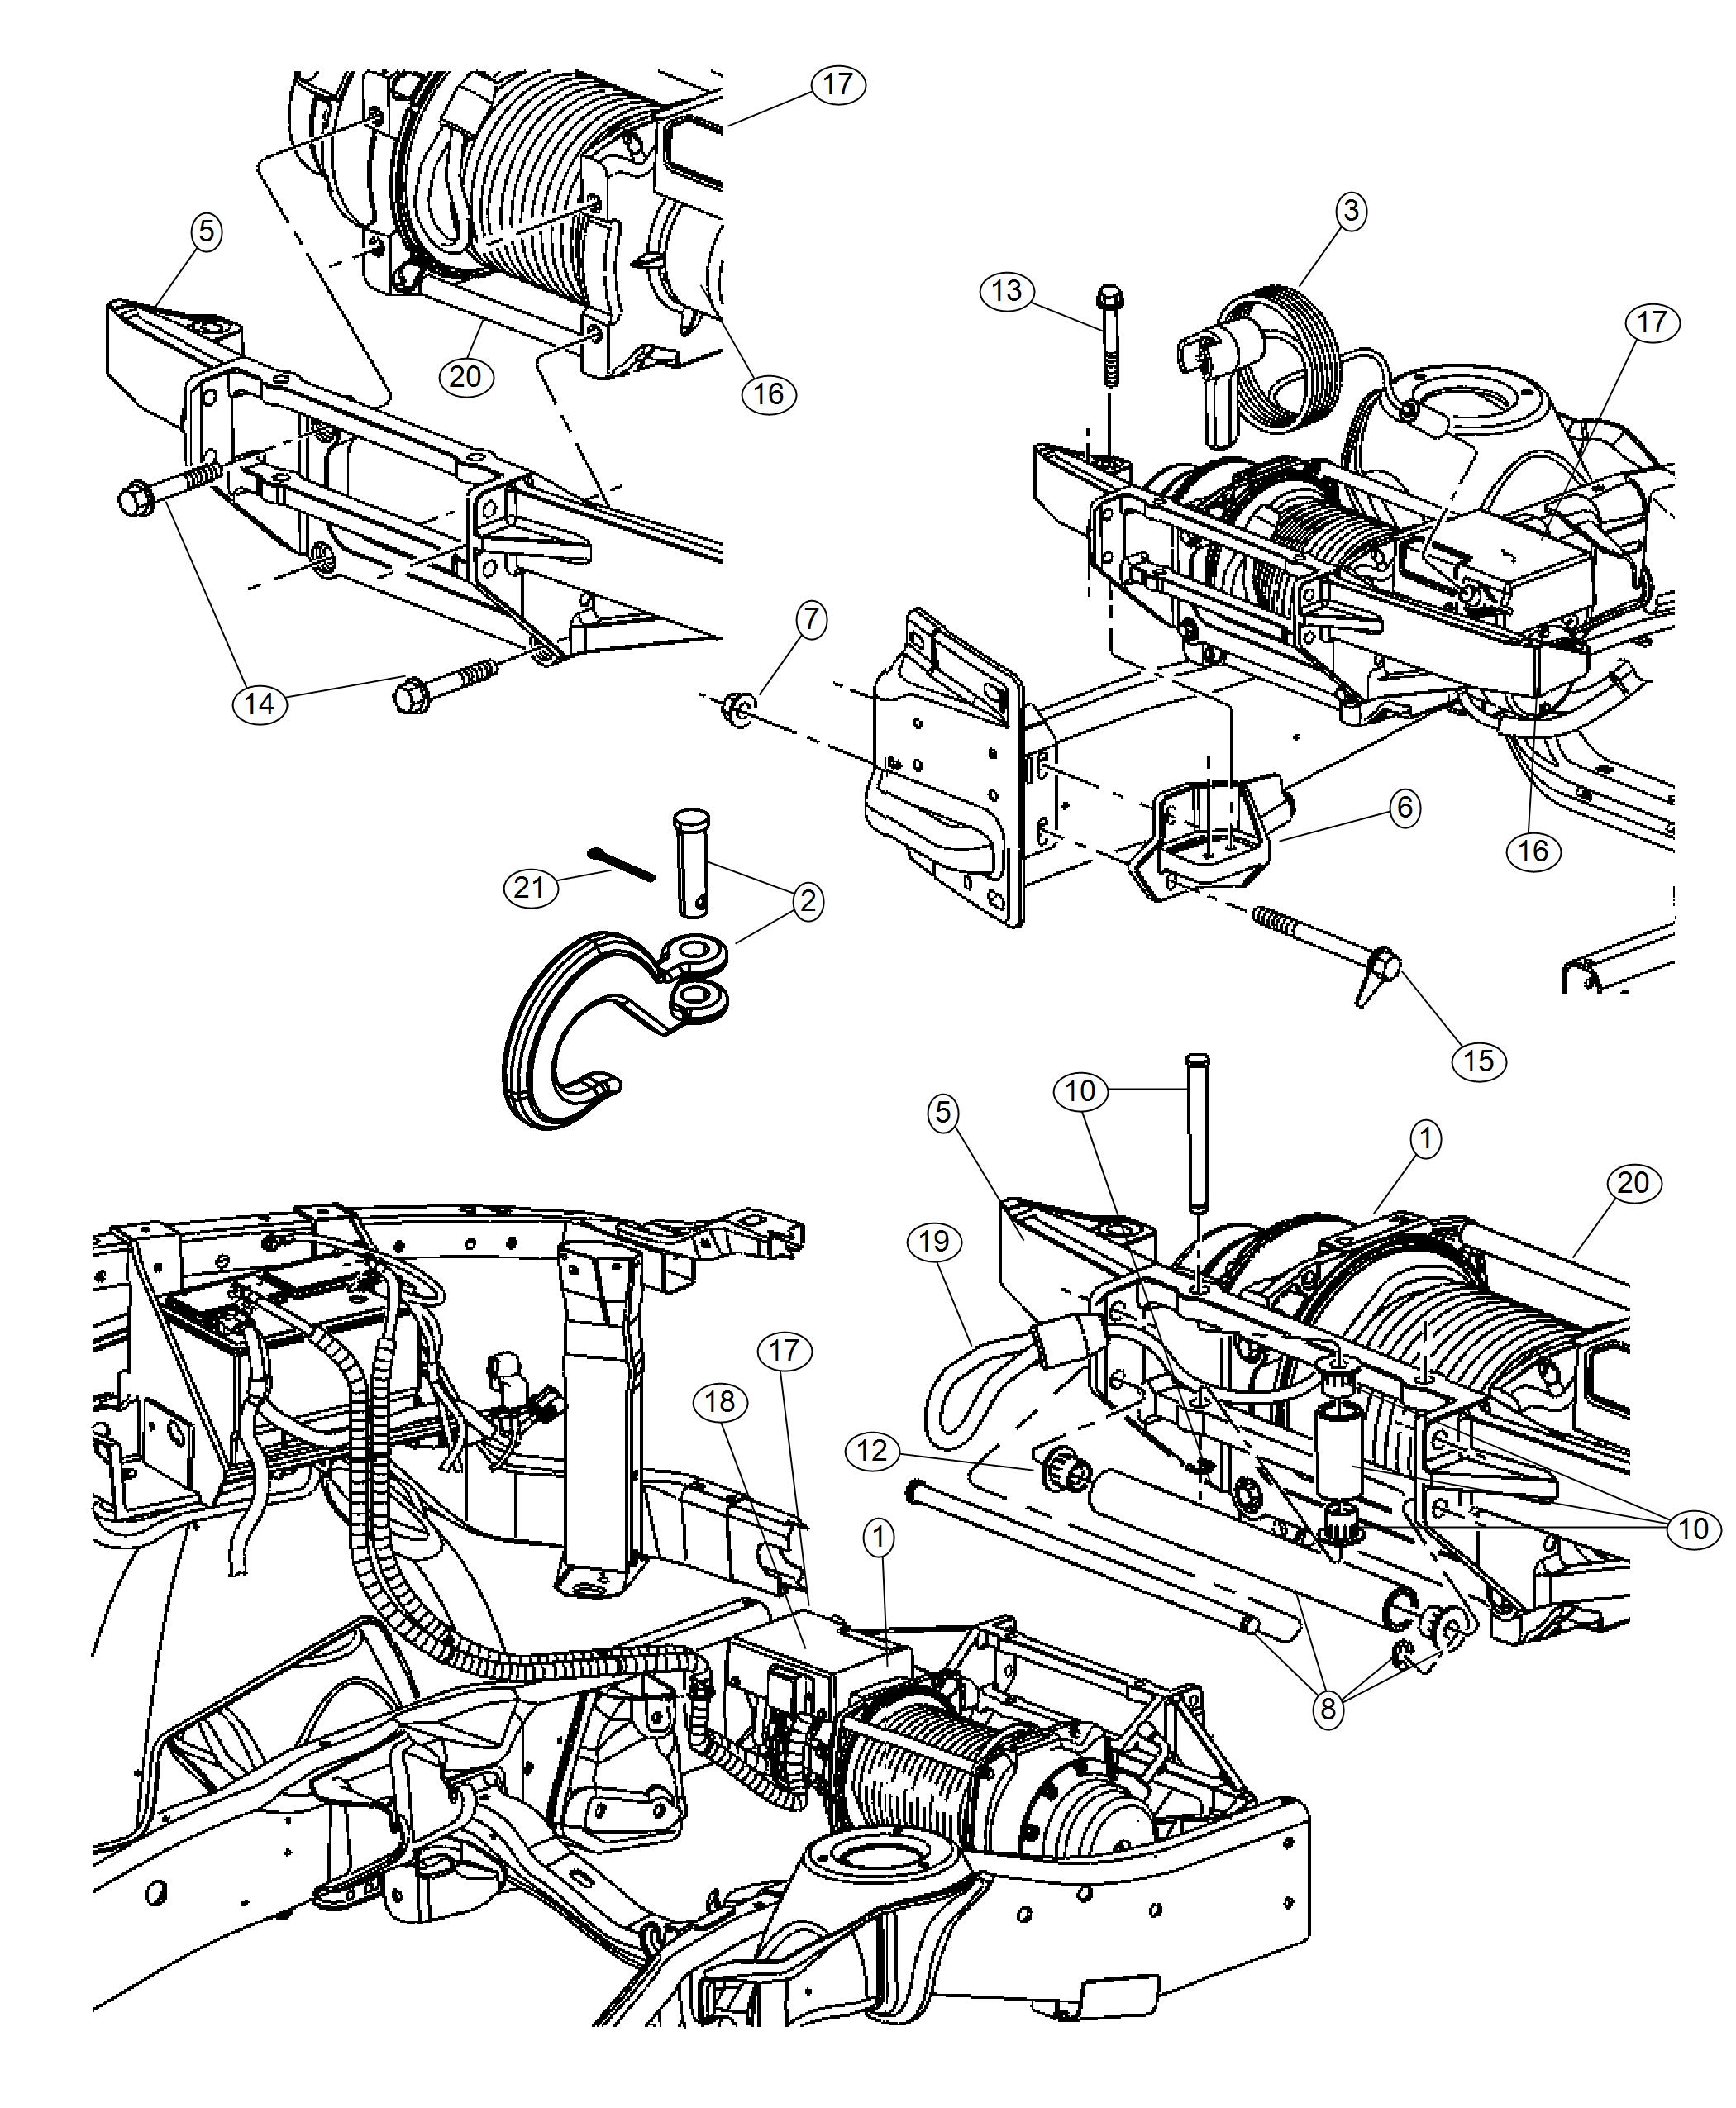 Ram Control Unit Winch Front Electric Winch Body